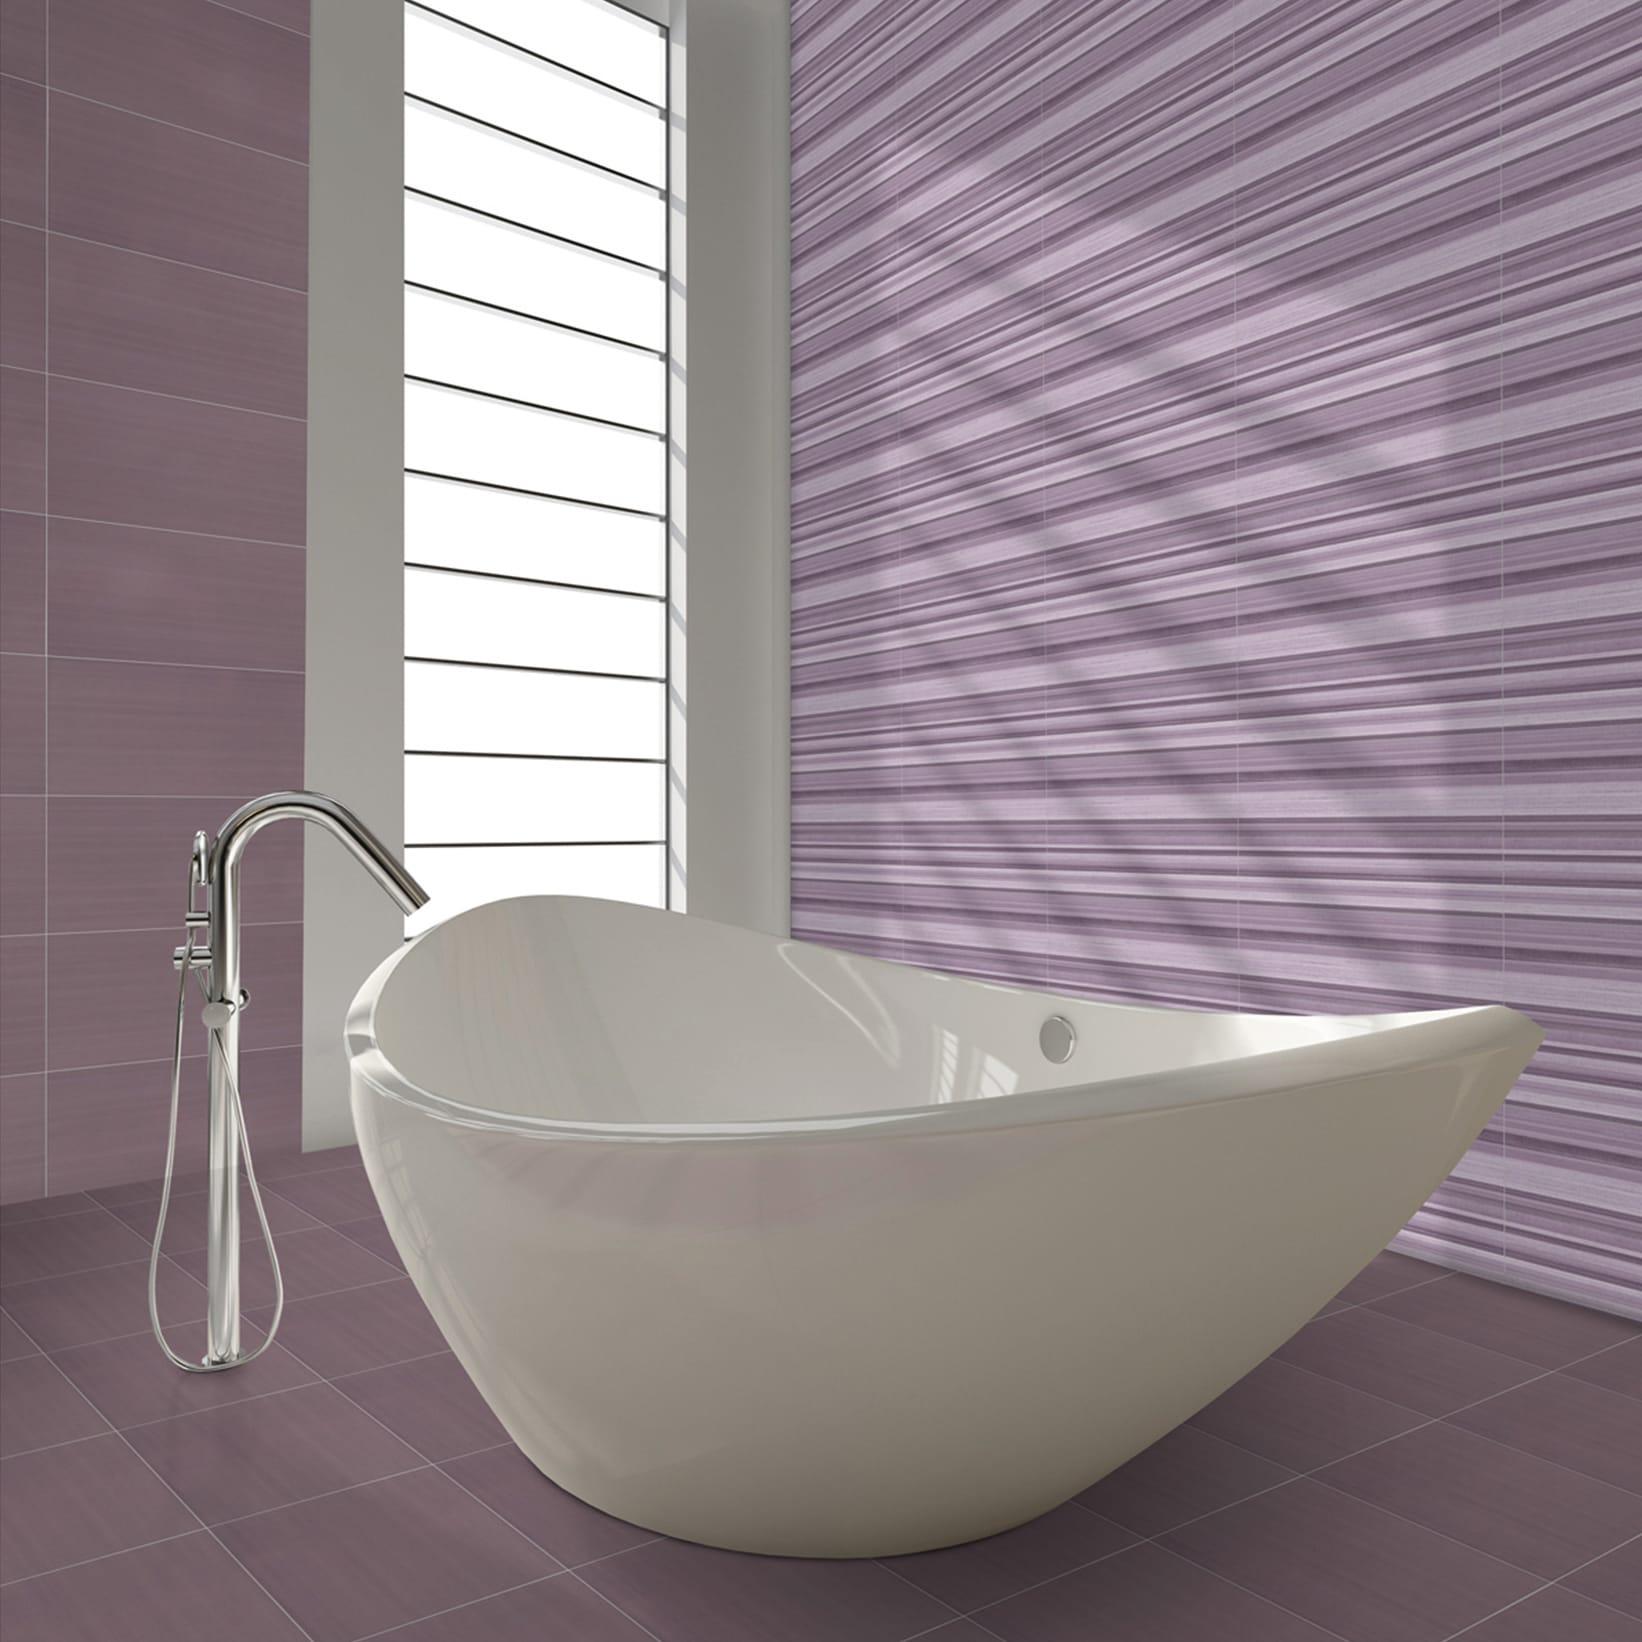 Piastrelle Bagno Mosaico Viola piastrella per rivestimenti kolor 30 x 60 cm sp. 10.3 mm viola